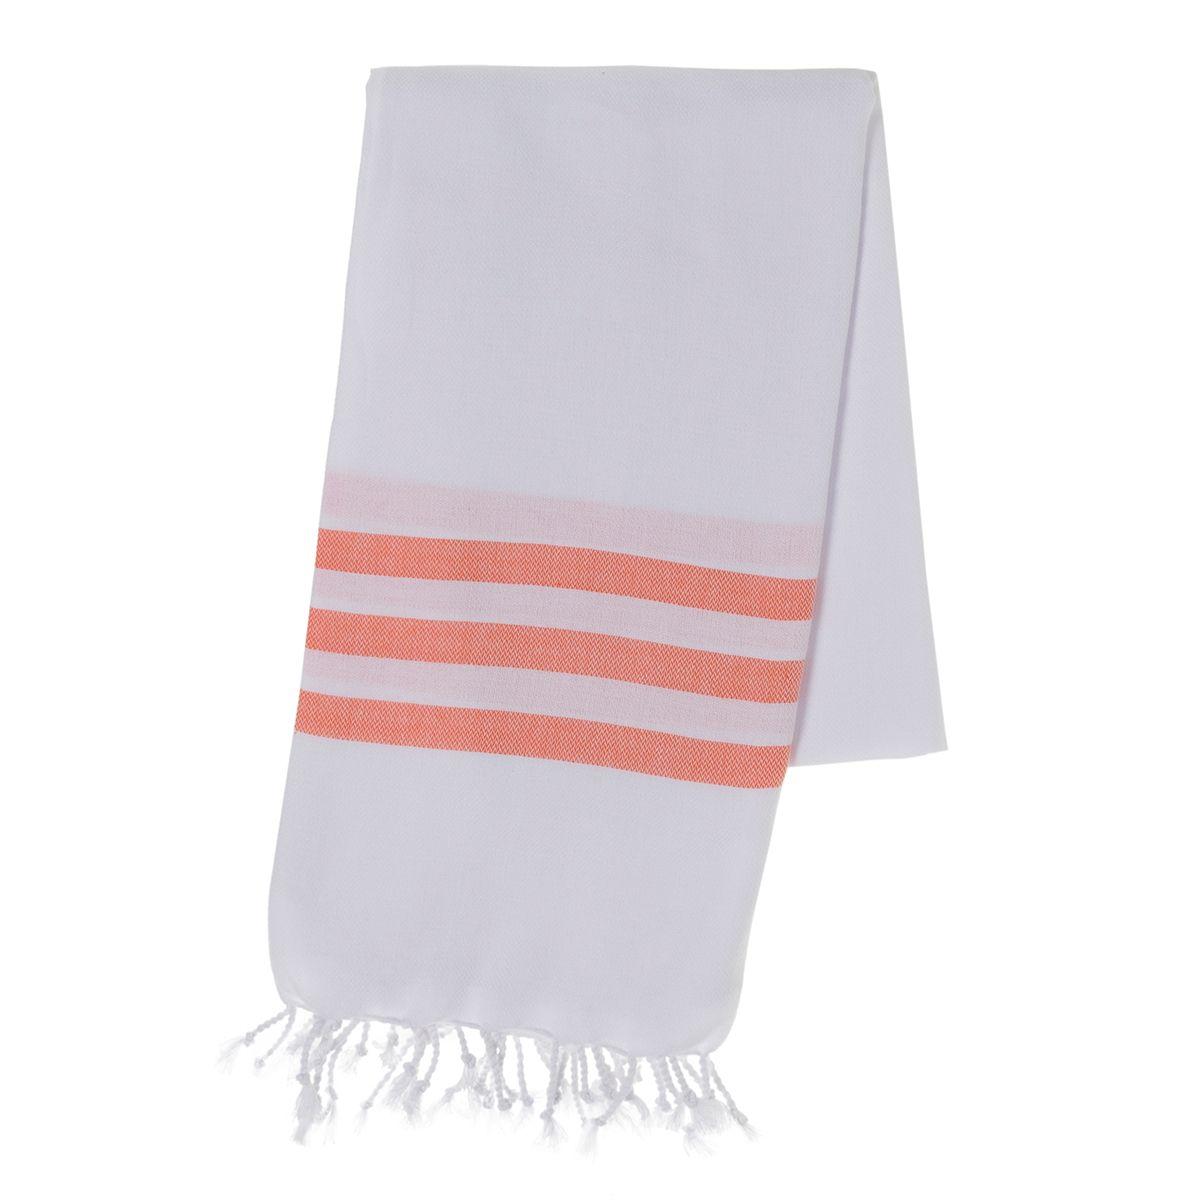 Peshtemal Bala Sultan - Orange Stripes